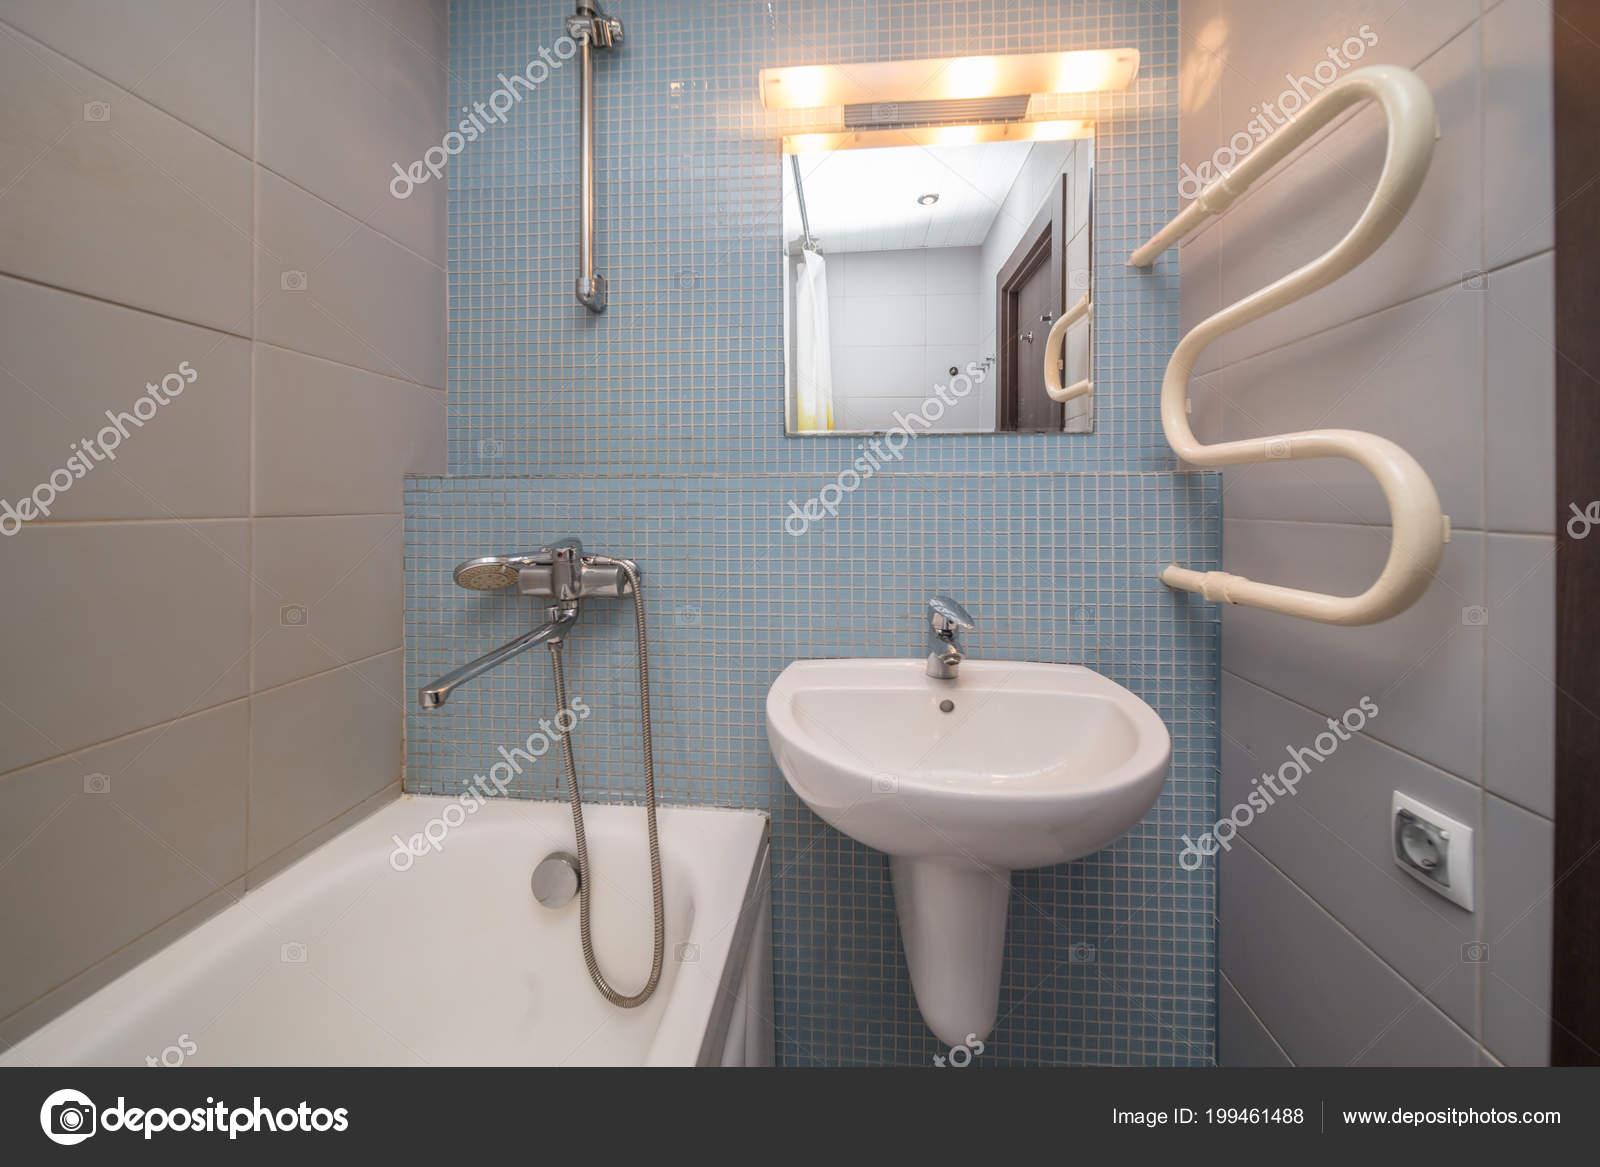 Small Grey Tile Bathroom Bath Tube Sink — Stock Photo © olgasweet ...